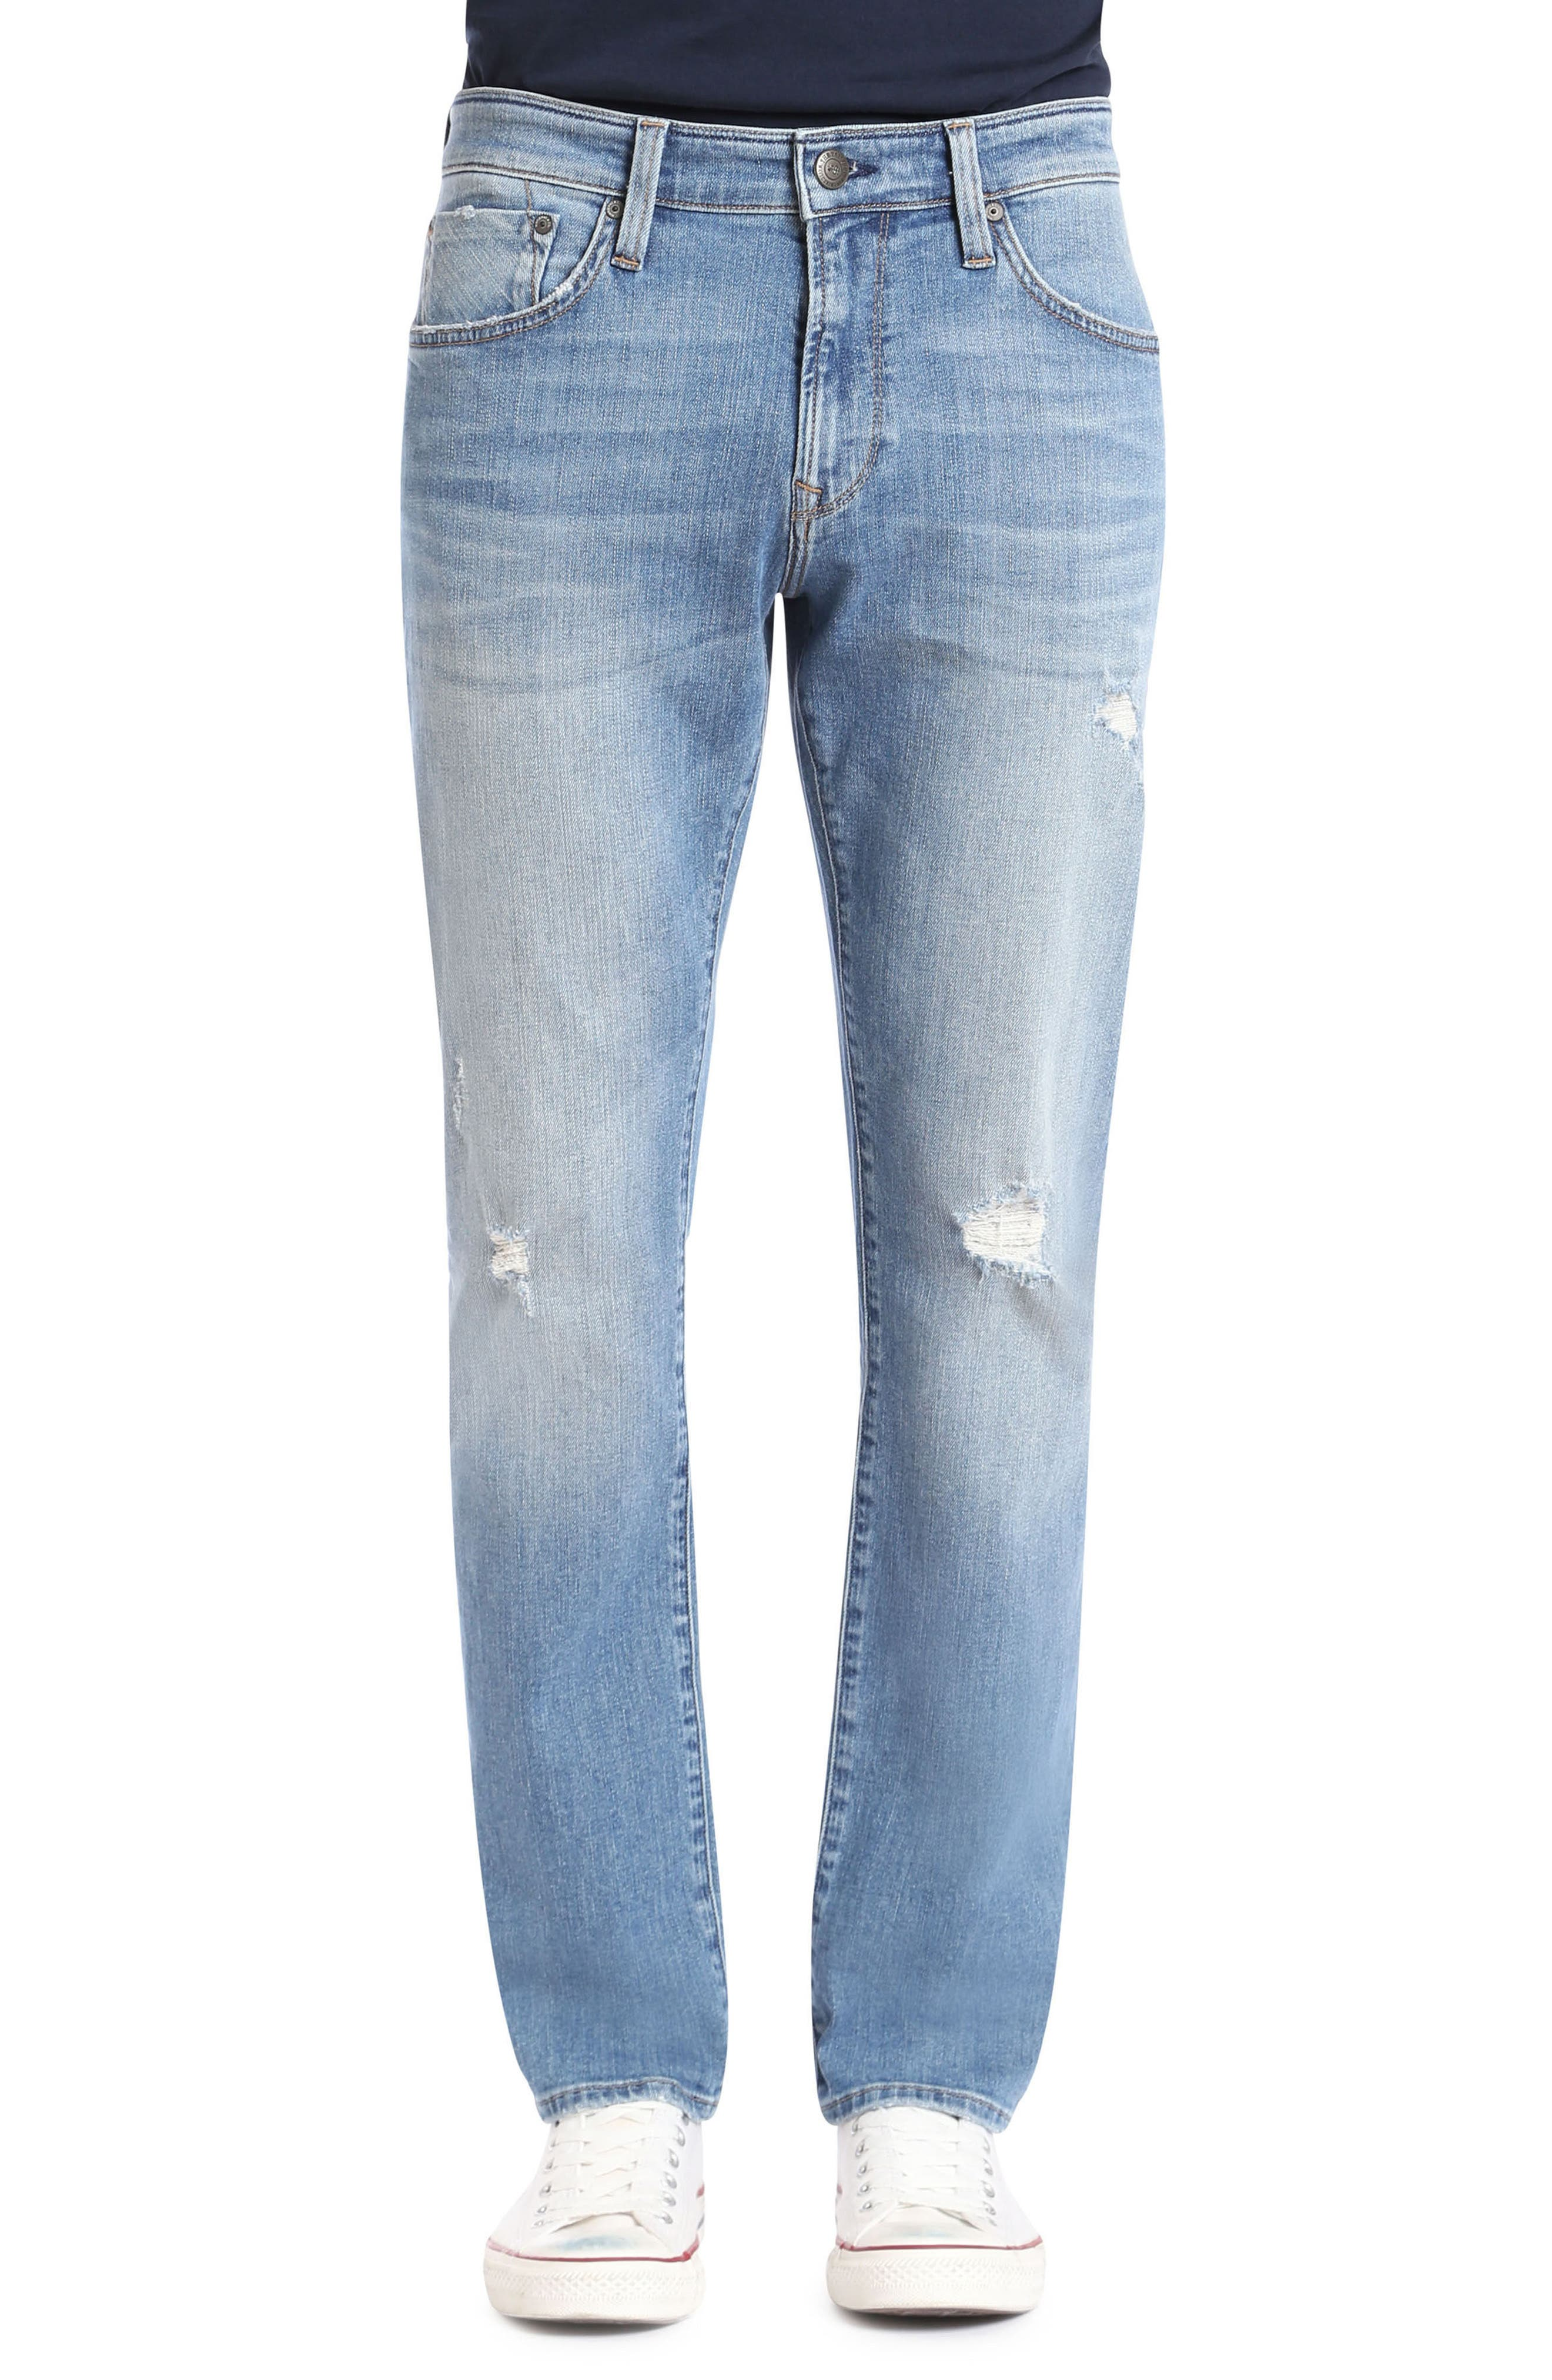 Jake Slim Fit Jeans,                             Main thumbnail 1, color,                             420